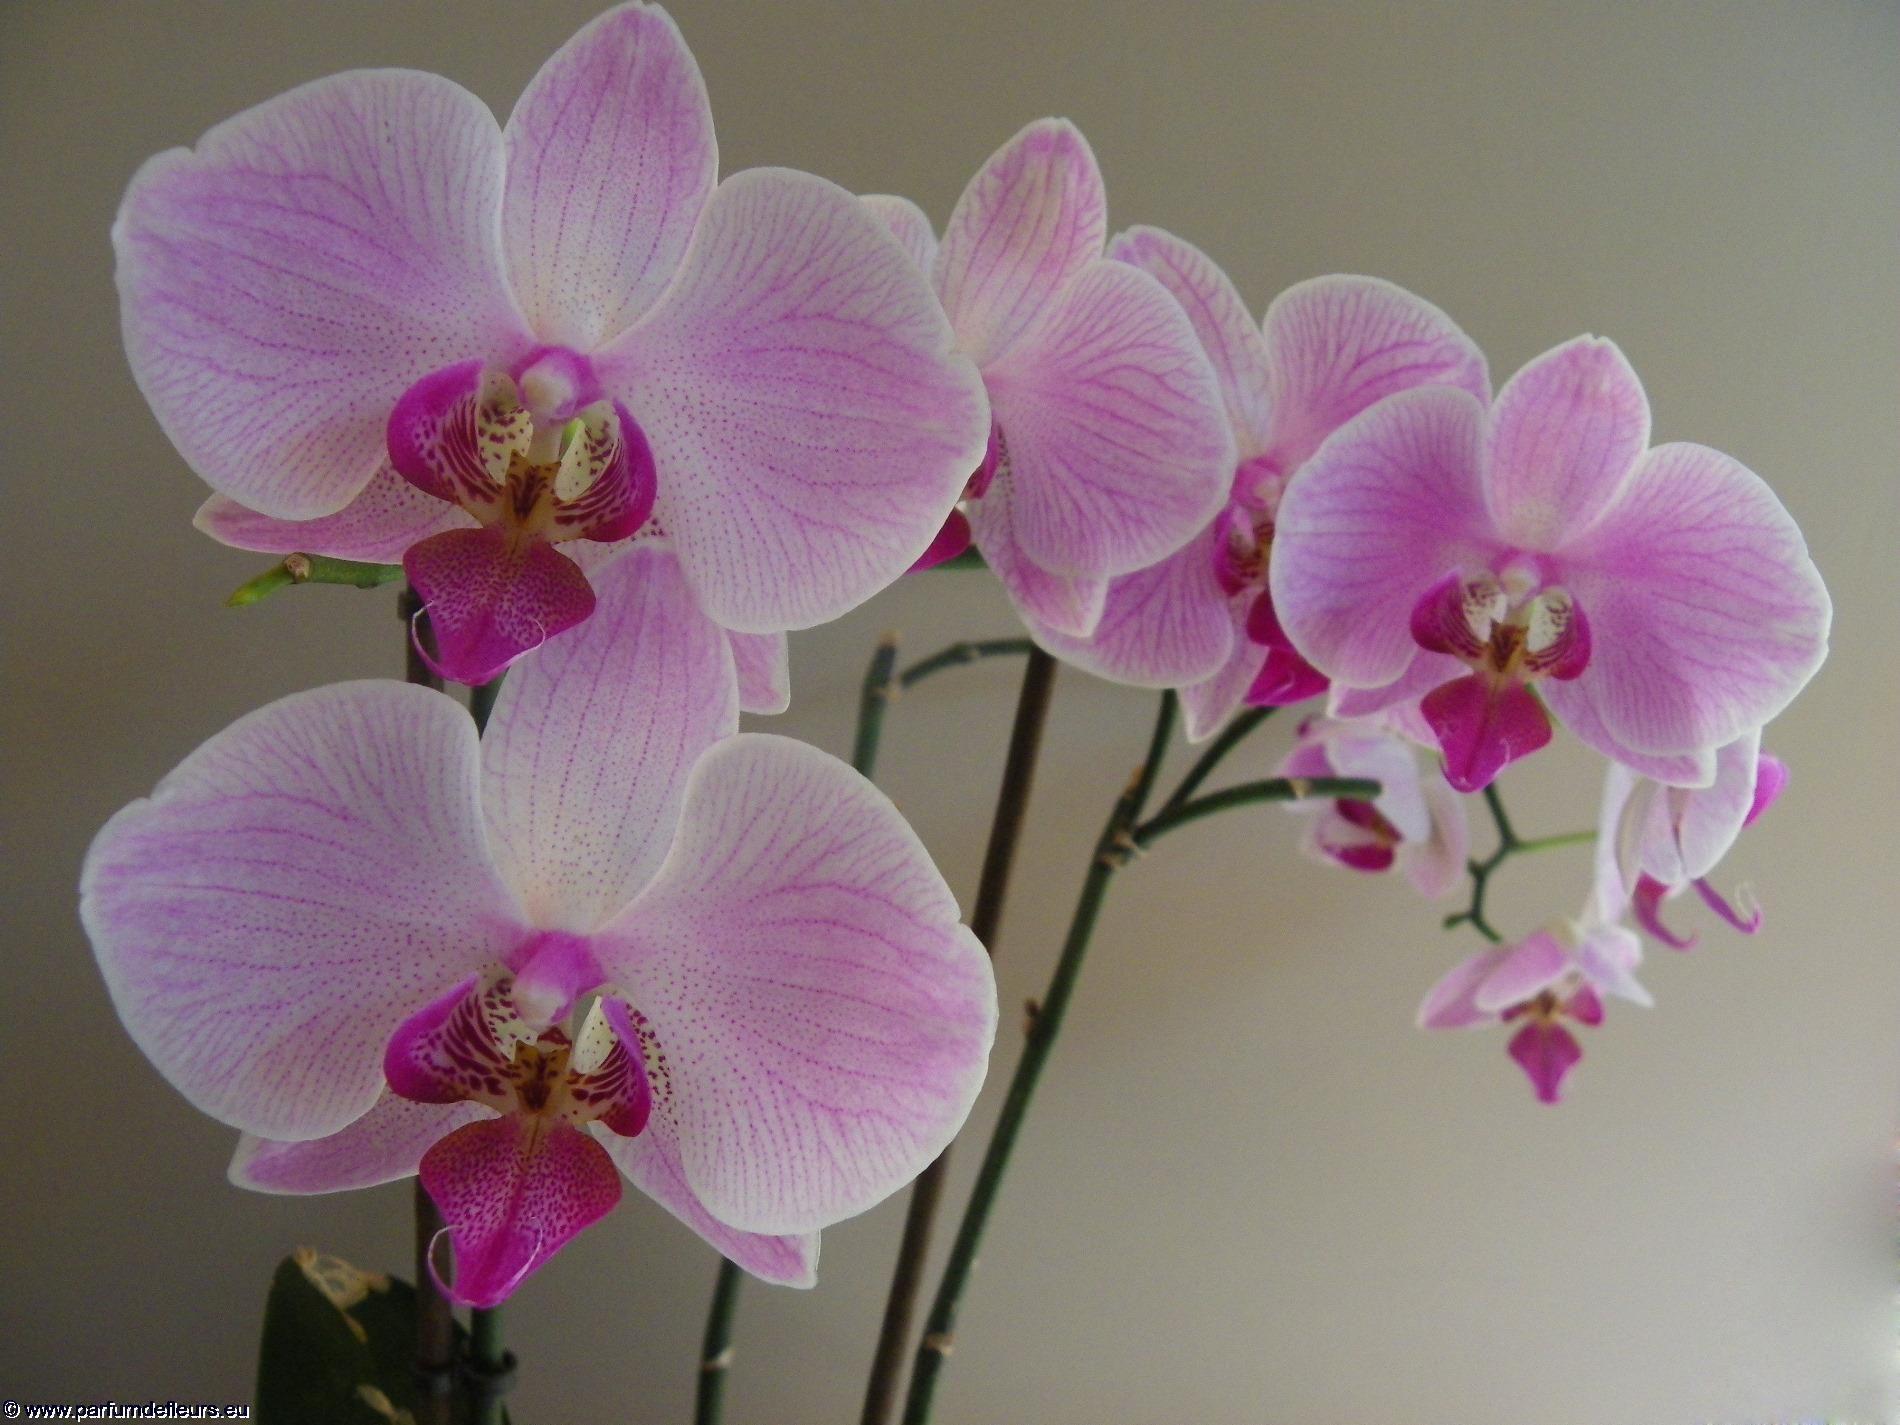 fonds d 39 cran des fleurs vous offrir fonds d 39 cran. Black Bedroom Furniture Sets. Home Design Ideas